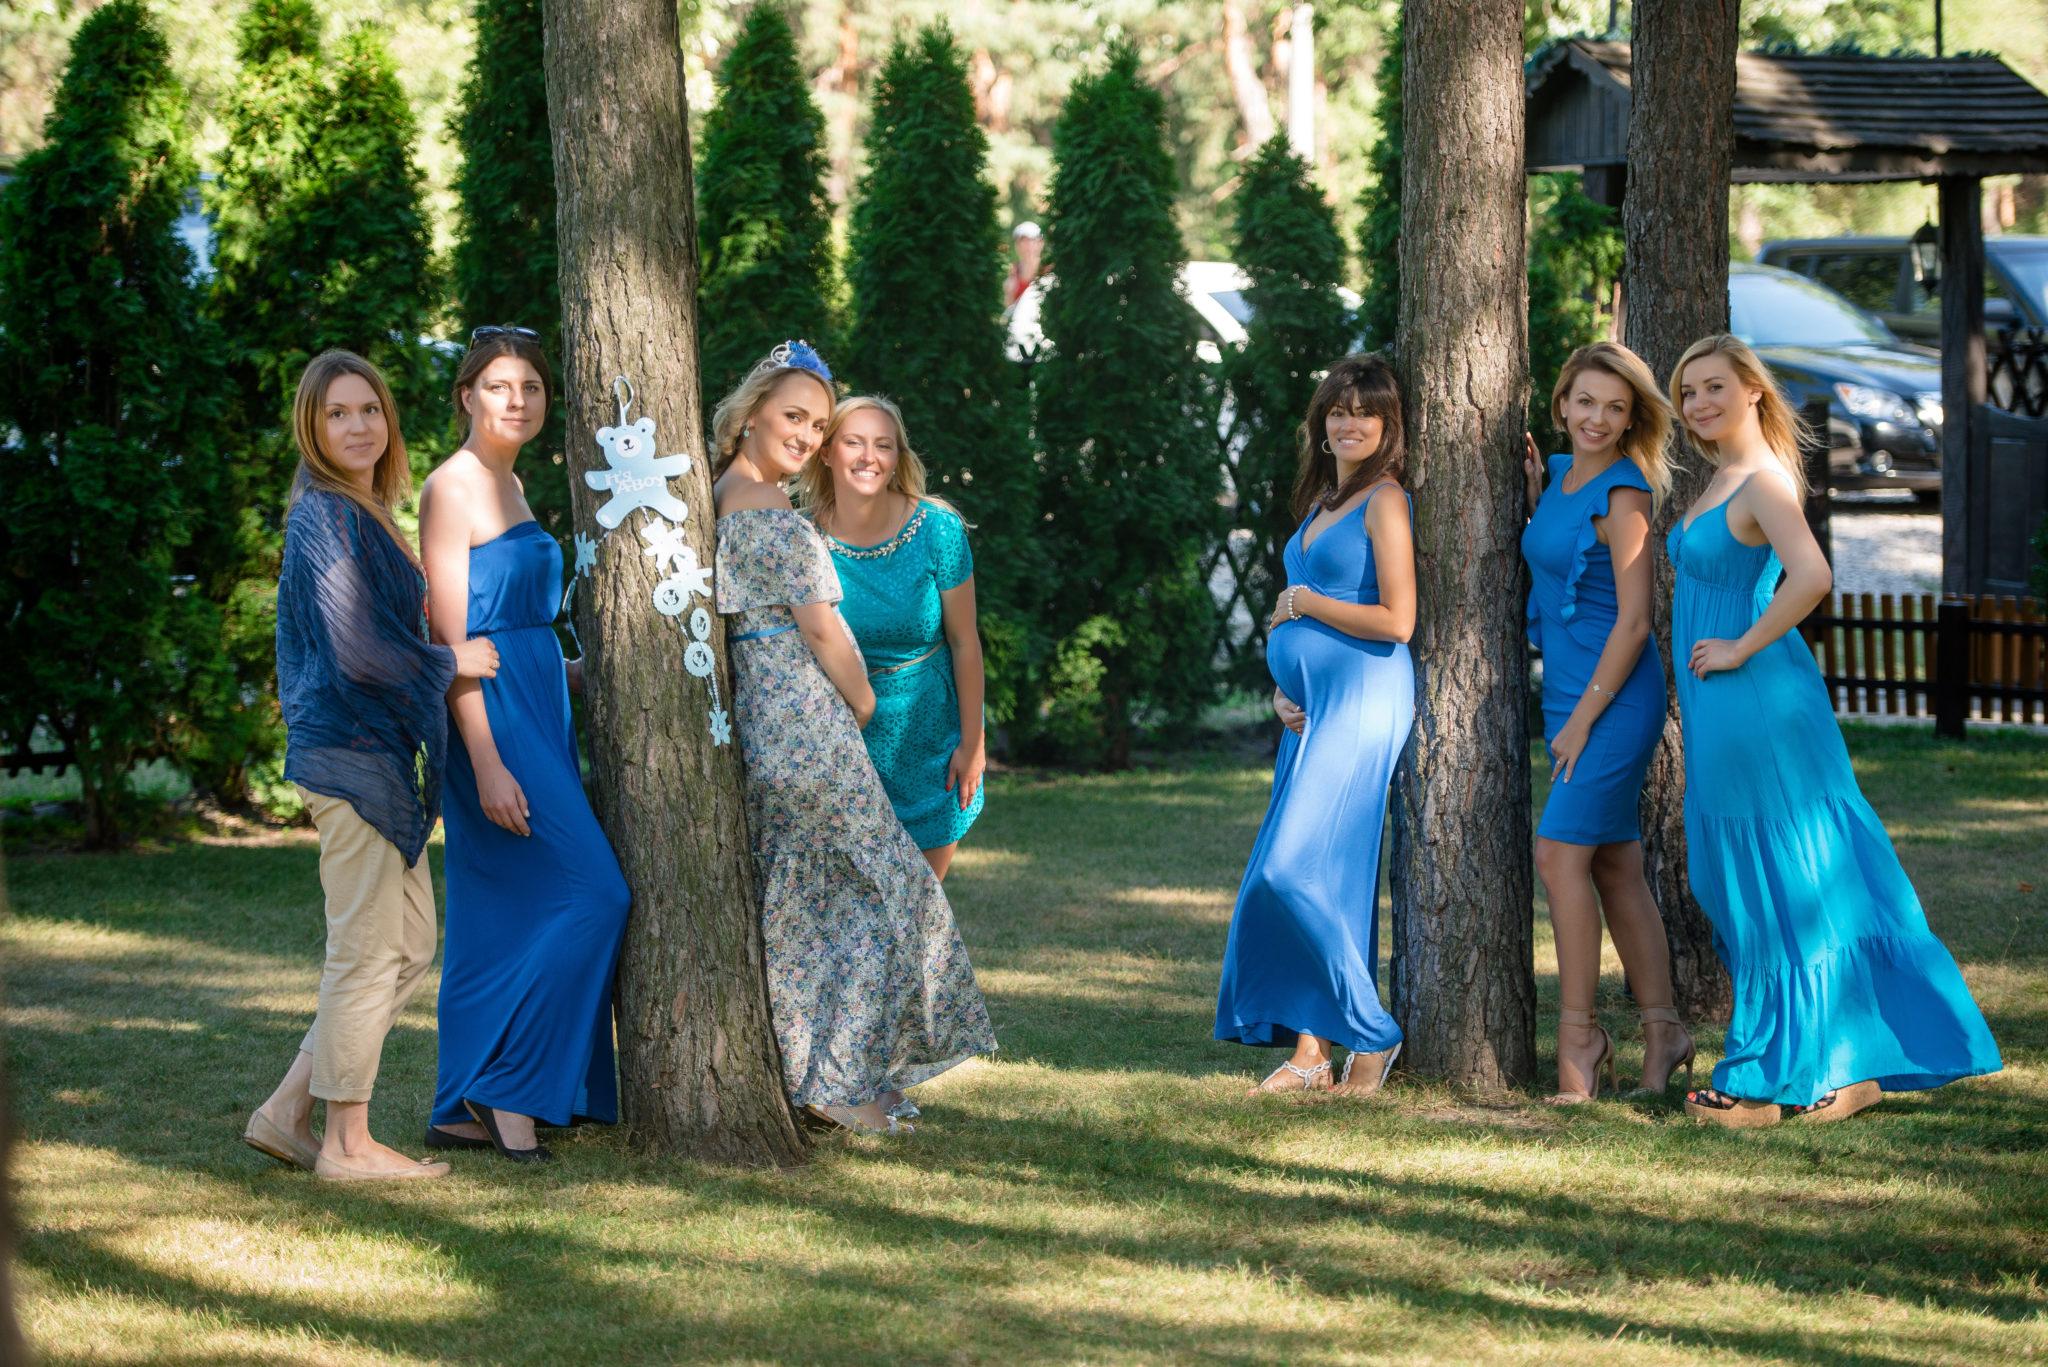 Девичник на природе, 7 девушек в парке